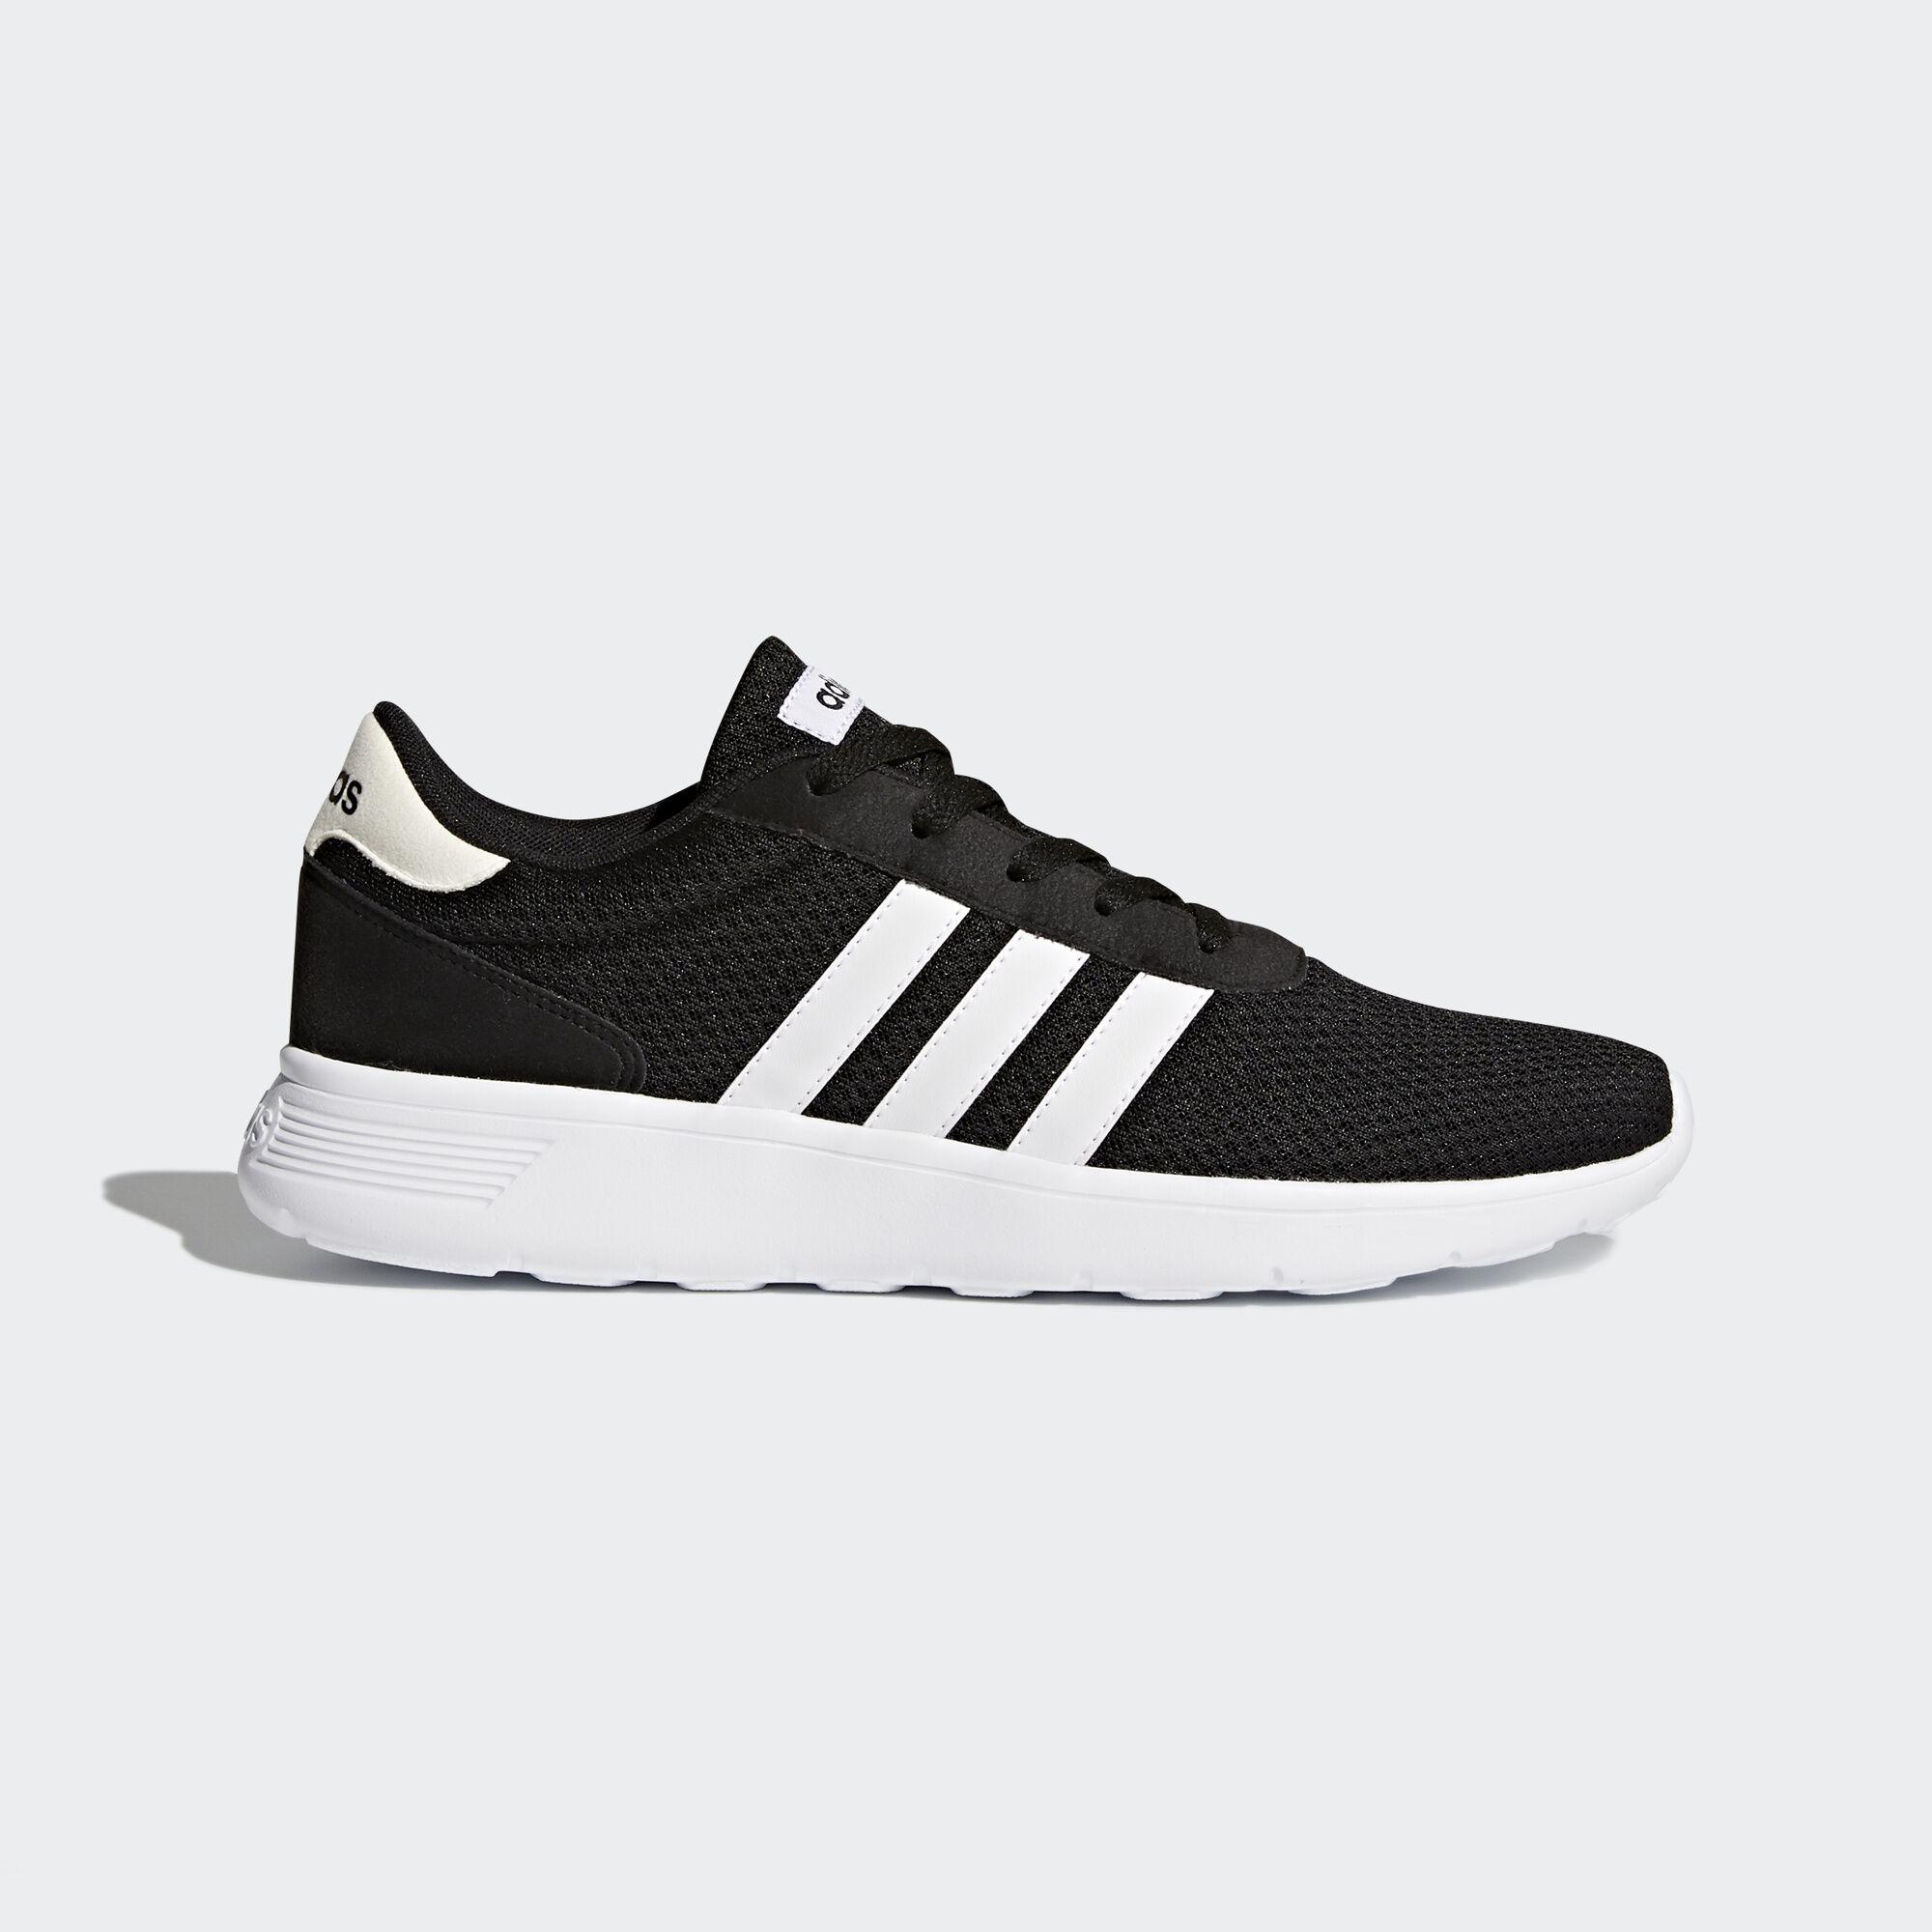 80bd449dadc9 adidas - Lite Racer Shoes Core Black Footwear White BB9774